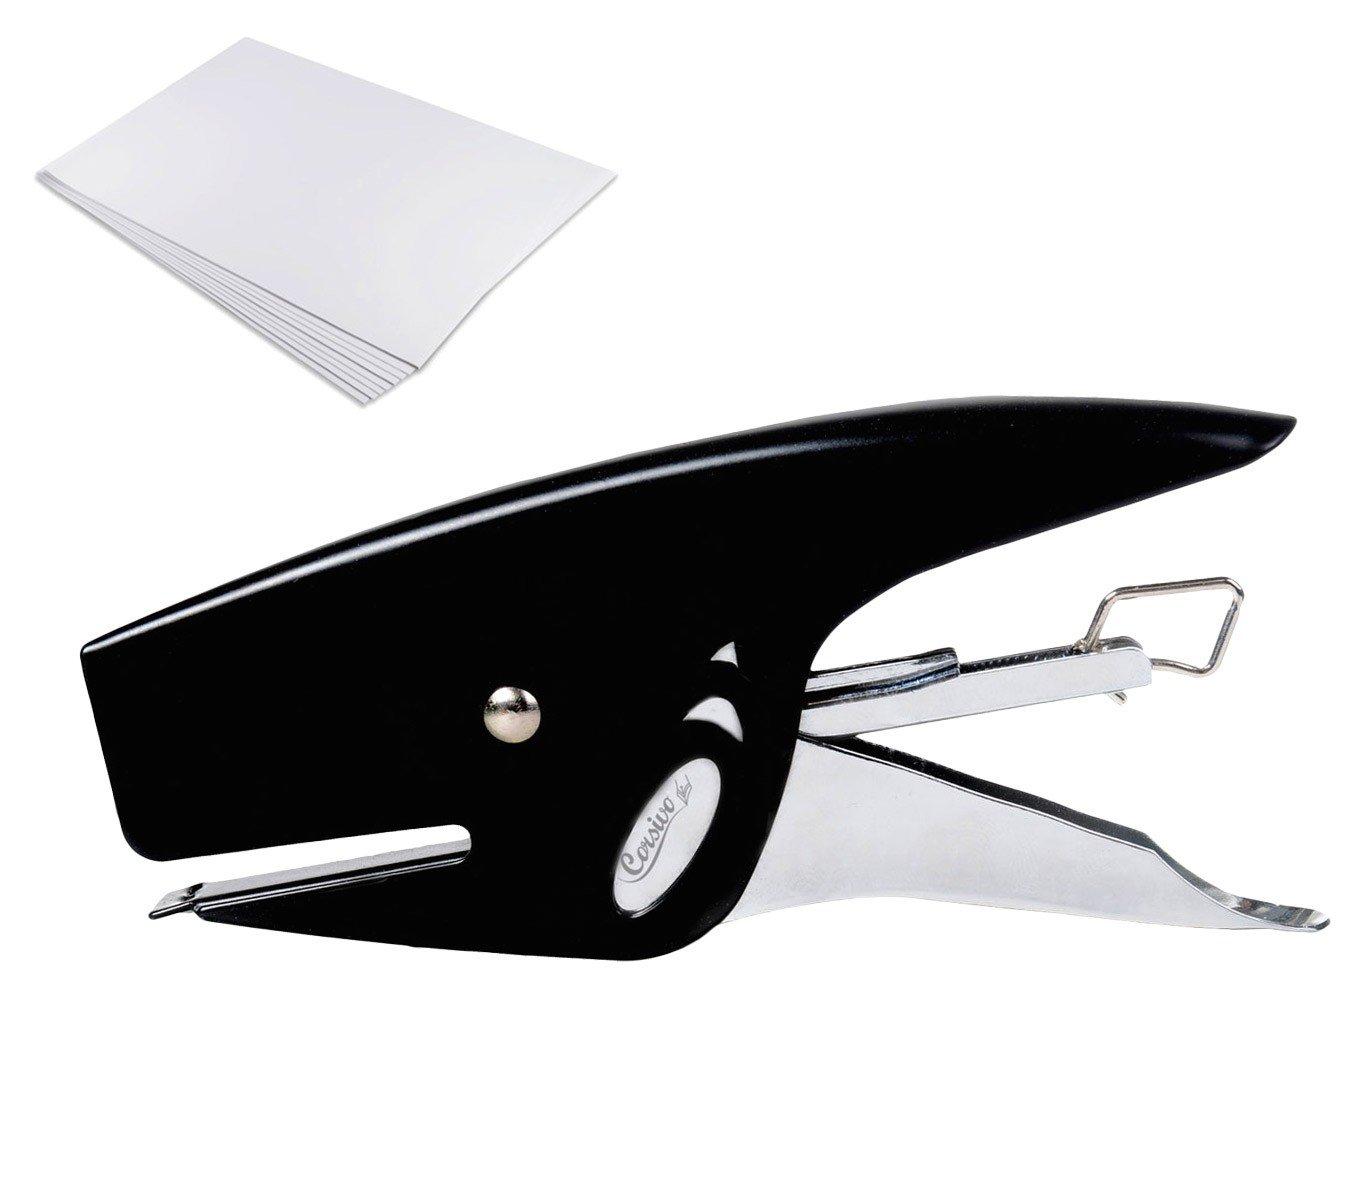 725250 Spillatrice o cucitrice a pinza adatta per punti universali 6 mm. MEDIA WAVE store ®